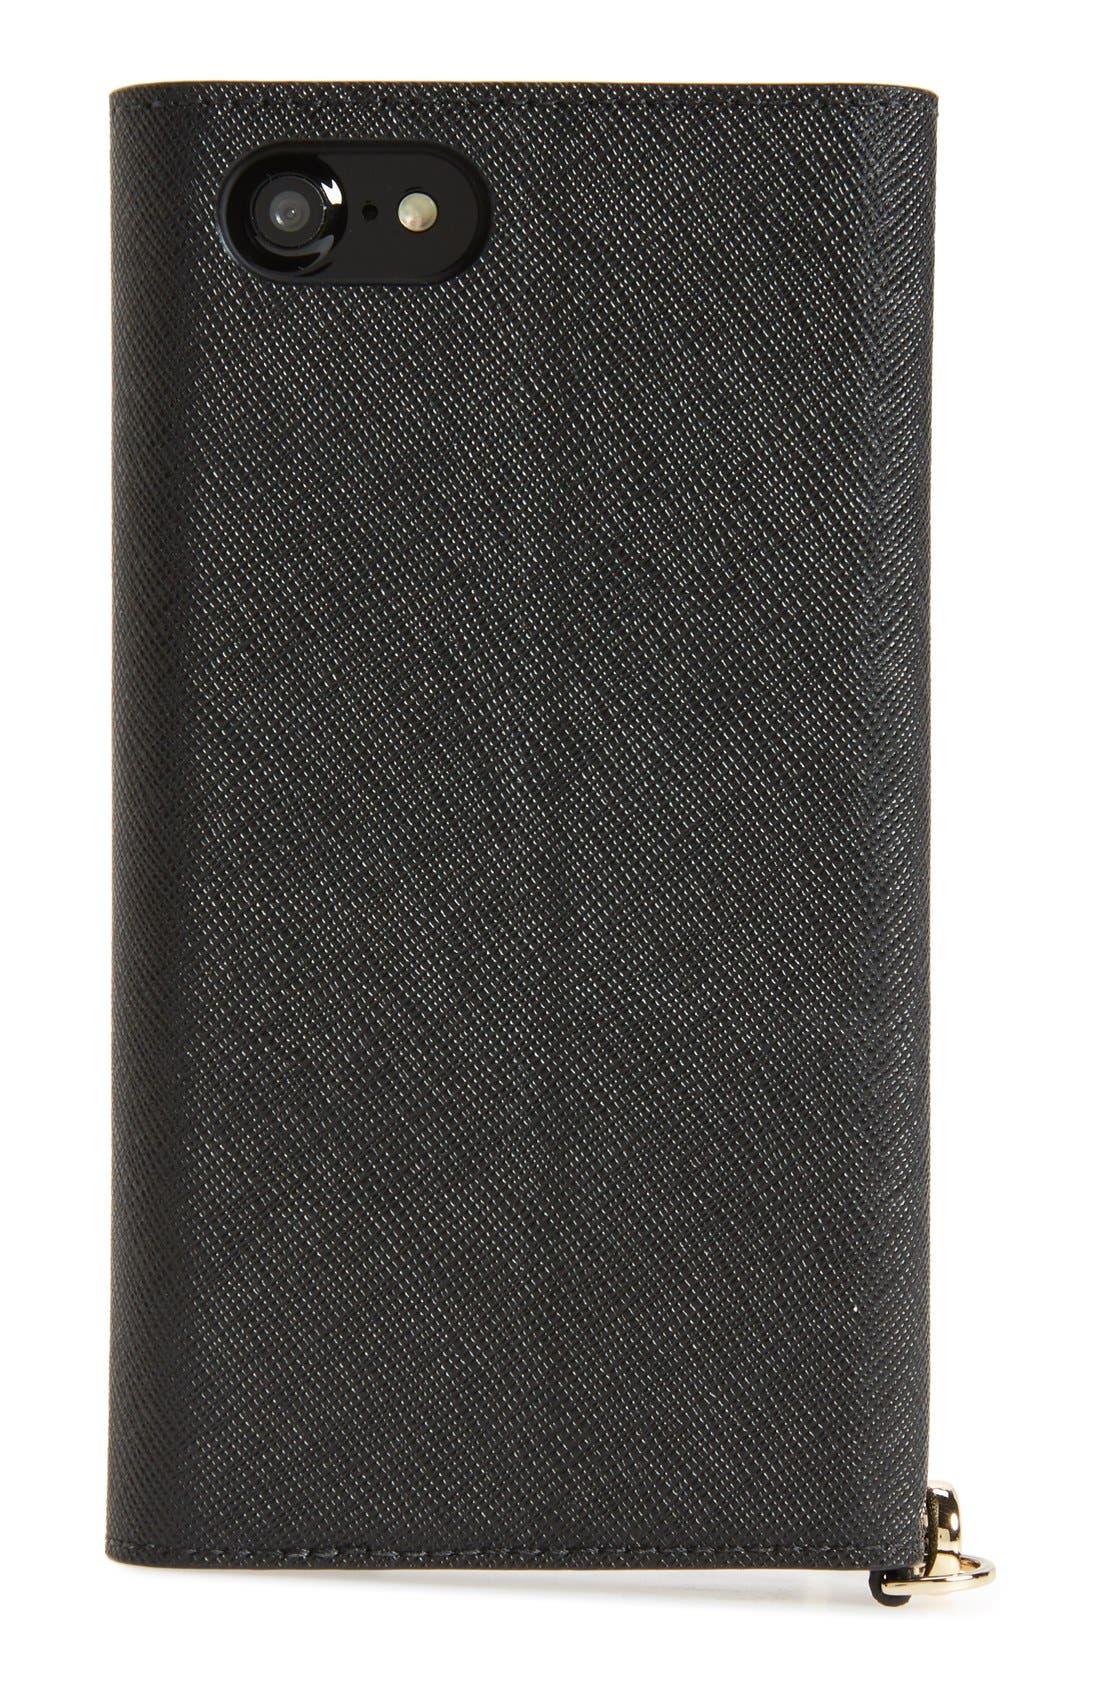 iPhone 7/8 & 7/8 Plus leather wristlet,                             Alternate thumbnail 10, color,                             BLACK